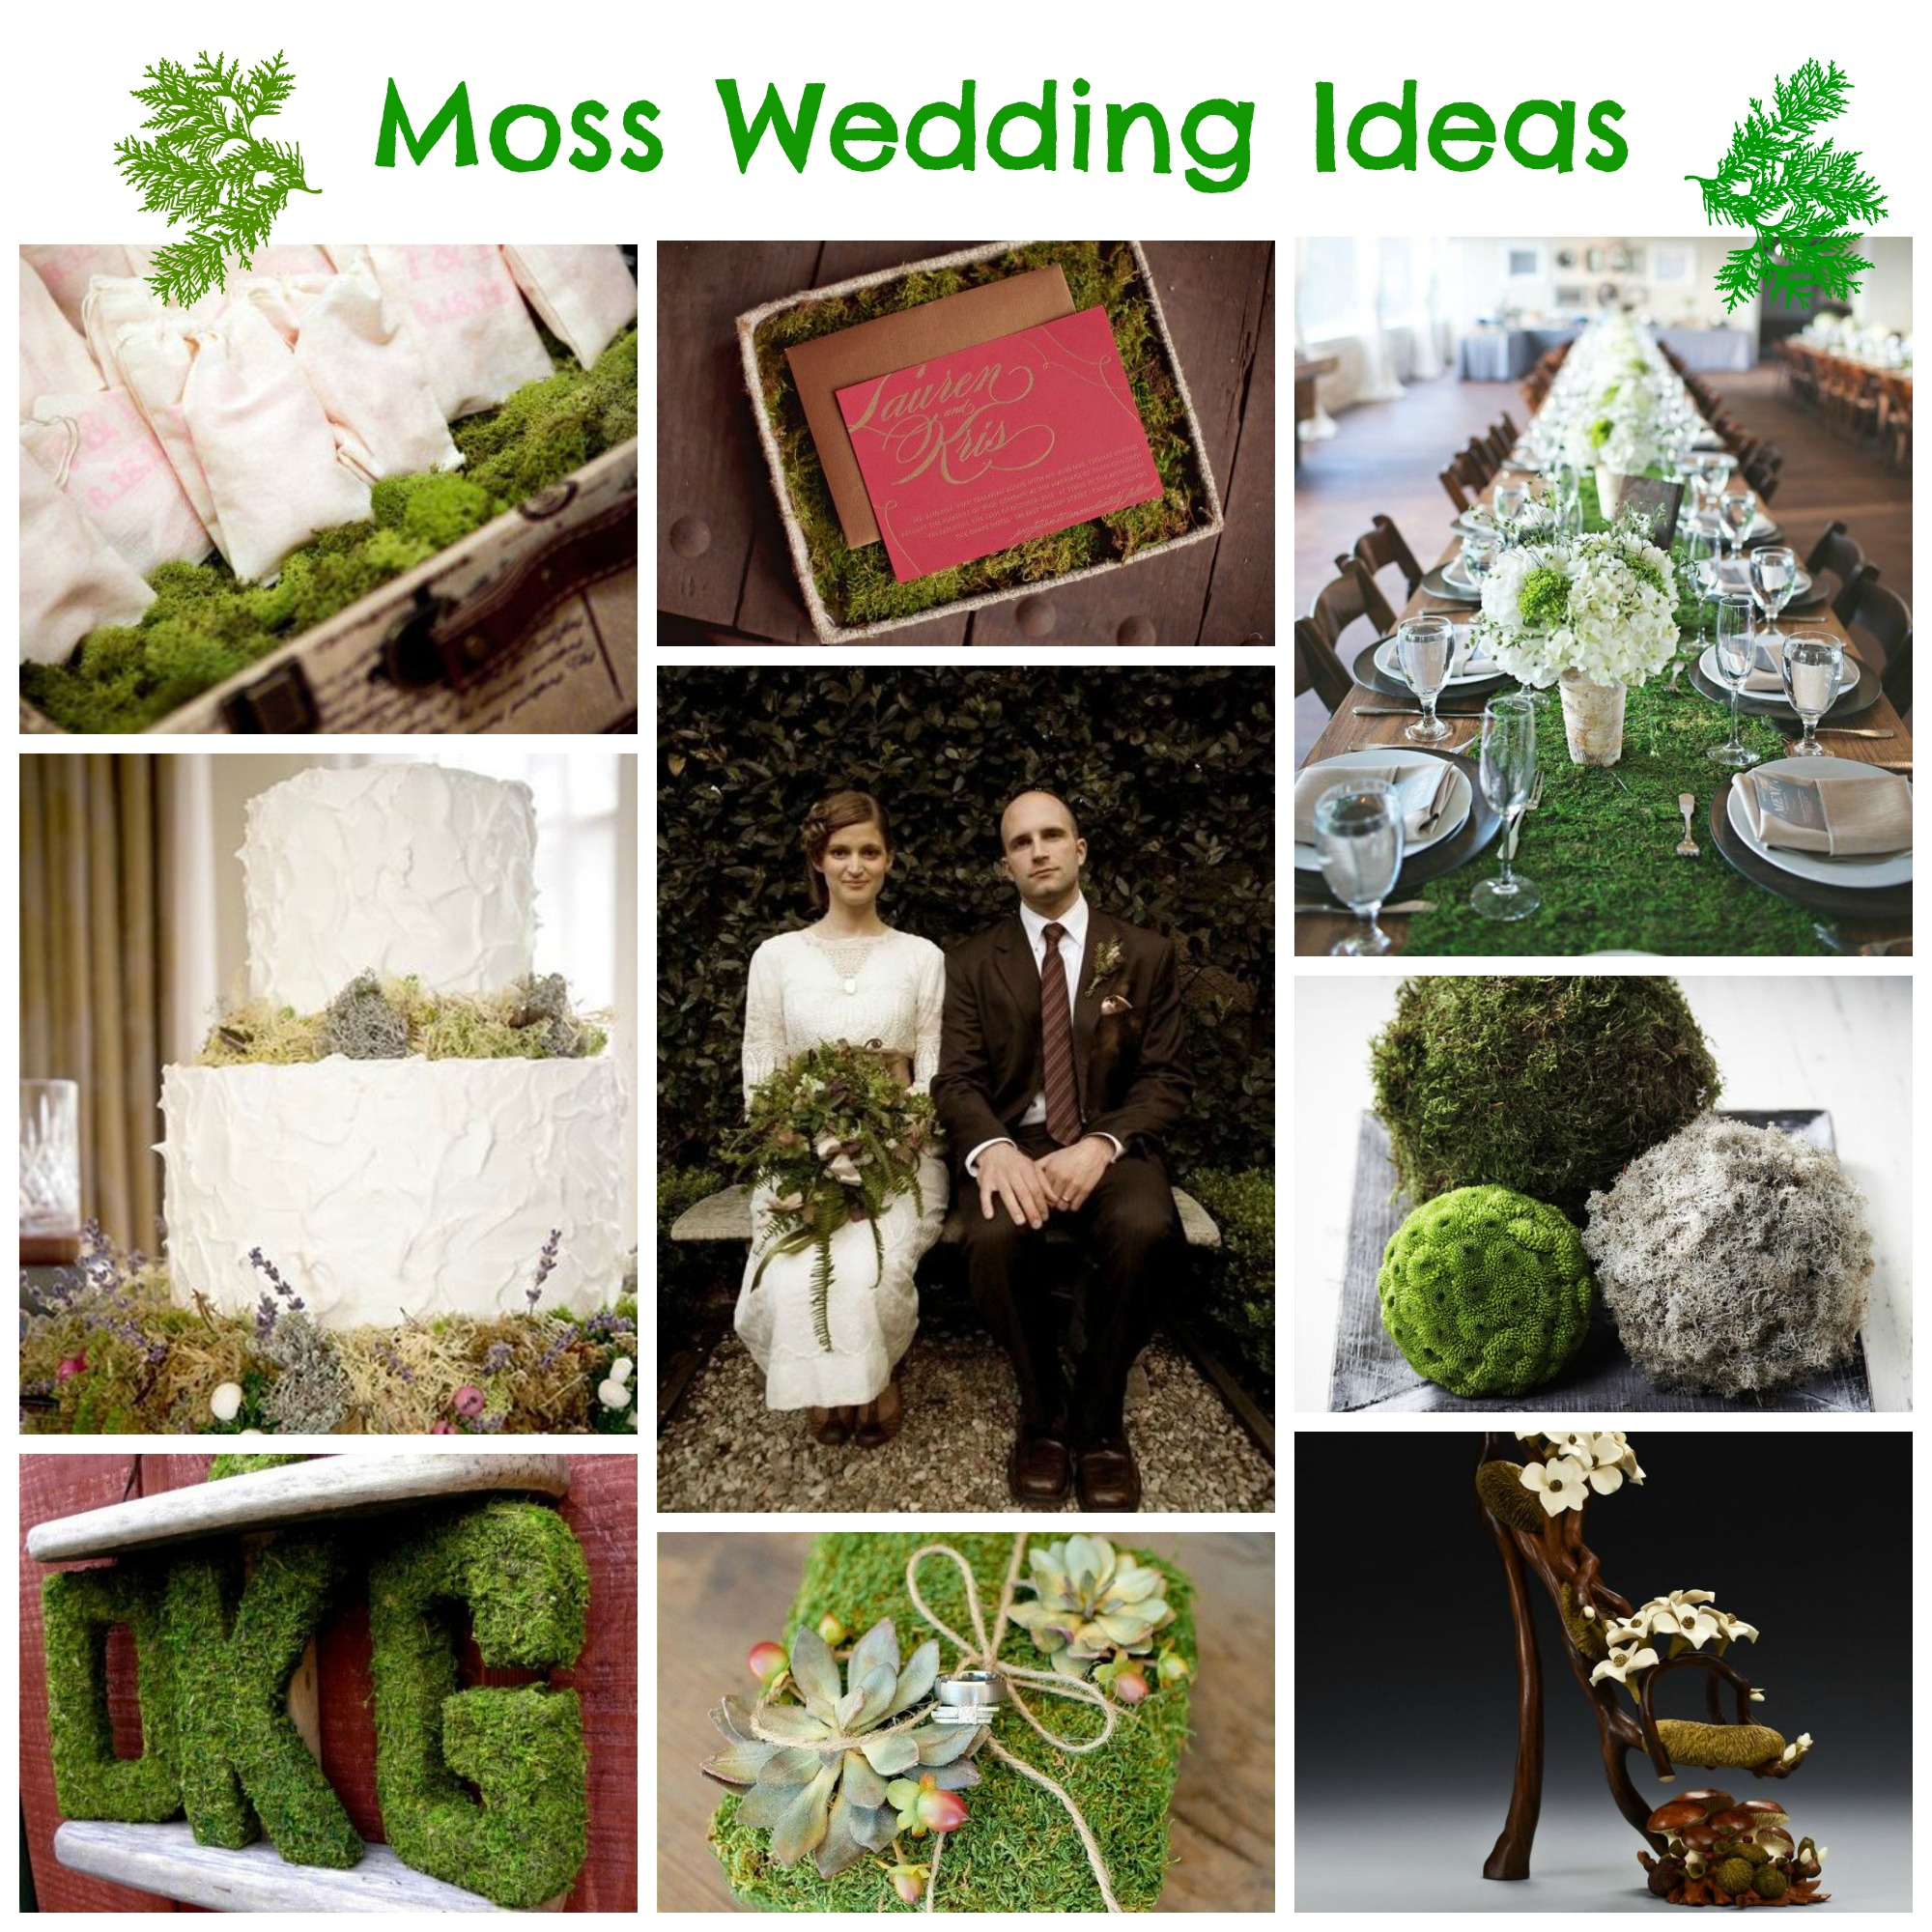 Wedding Ideas Vogue: The Natural Choice